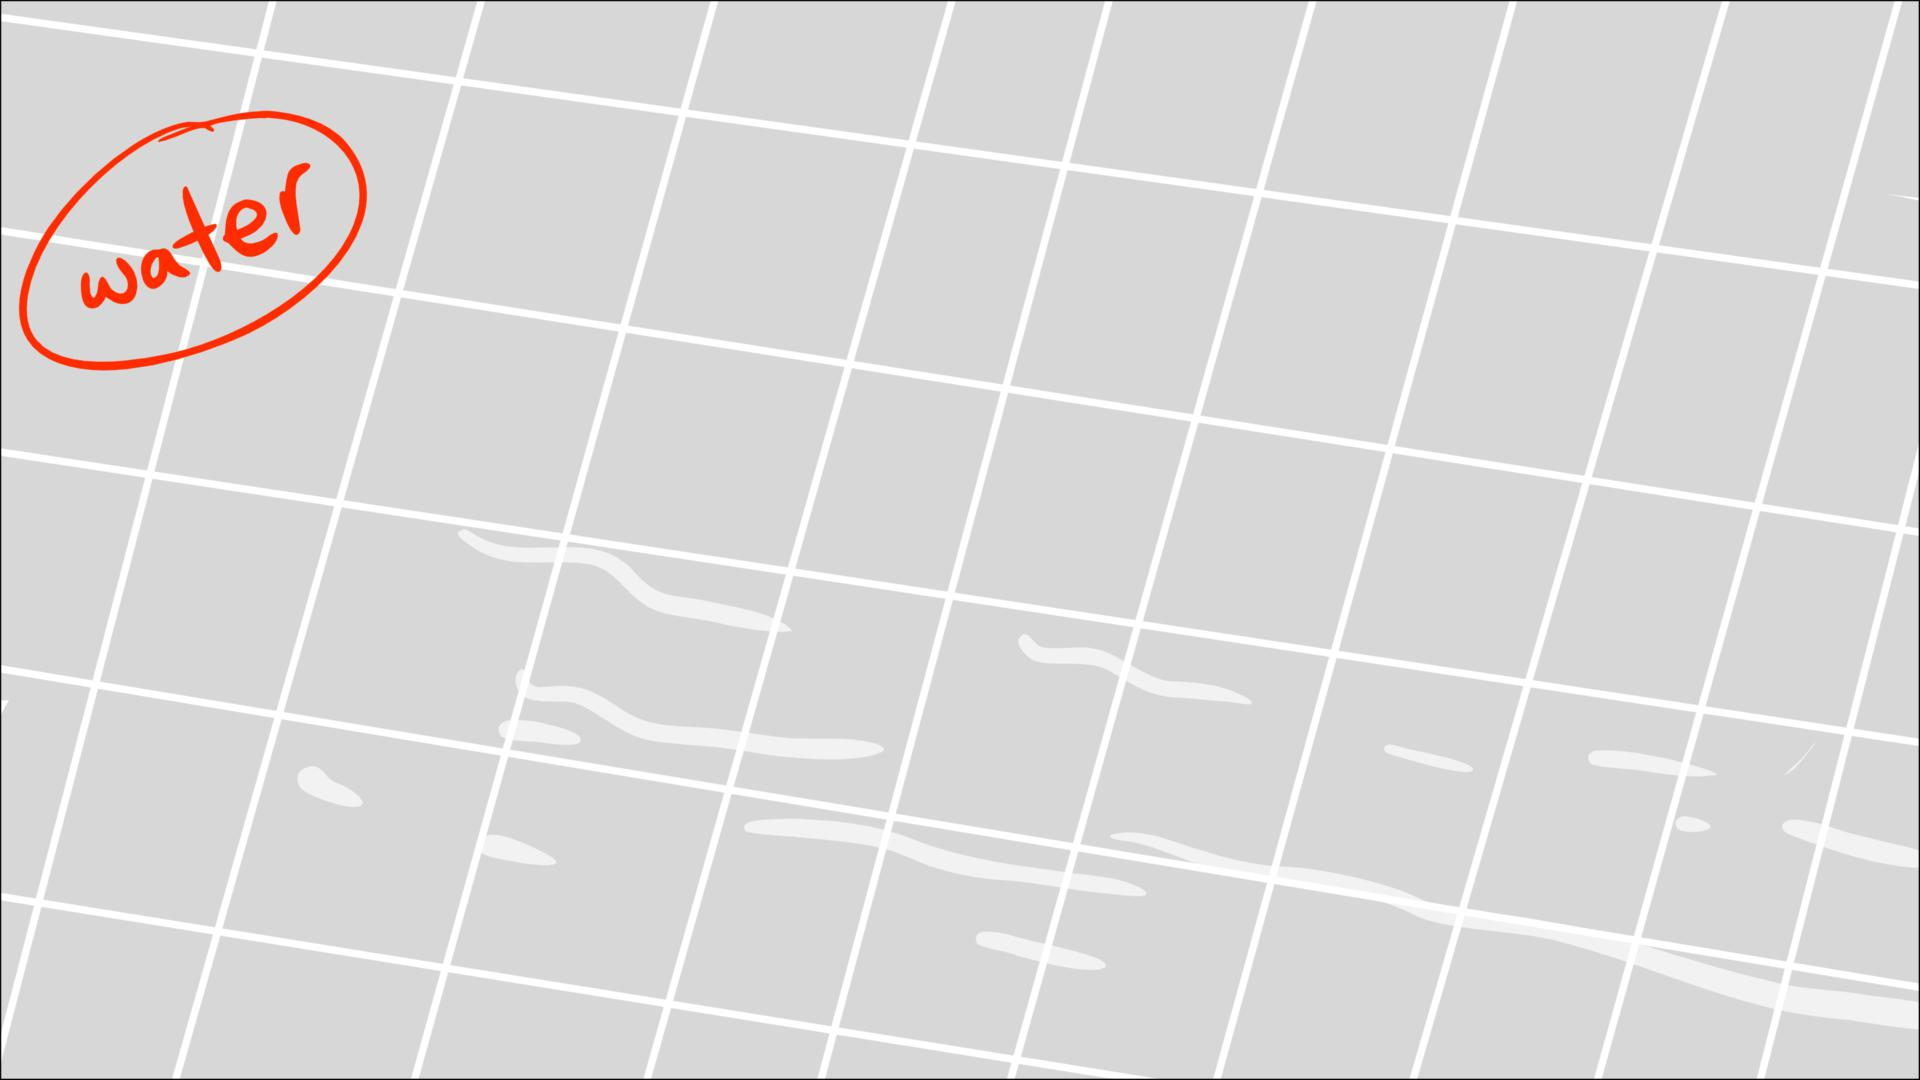 MS402_SQ11_057_01.jpg